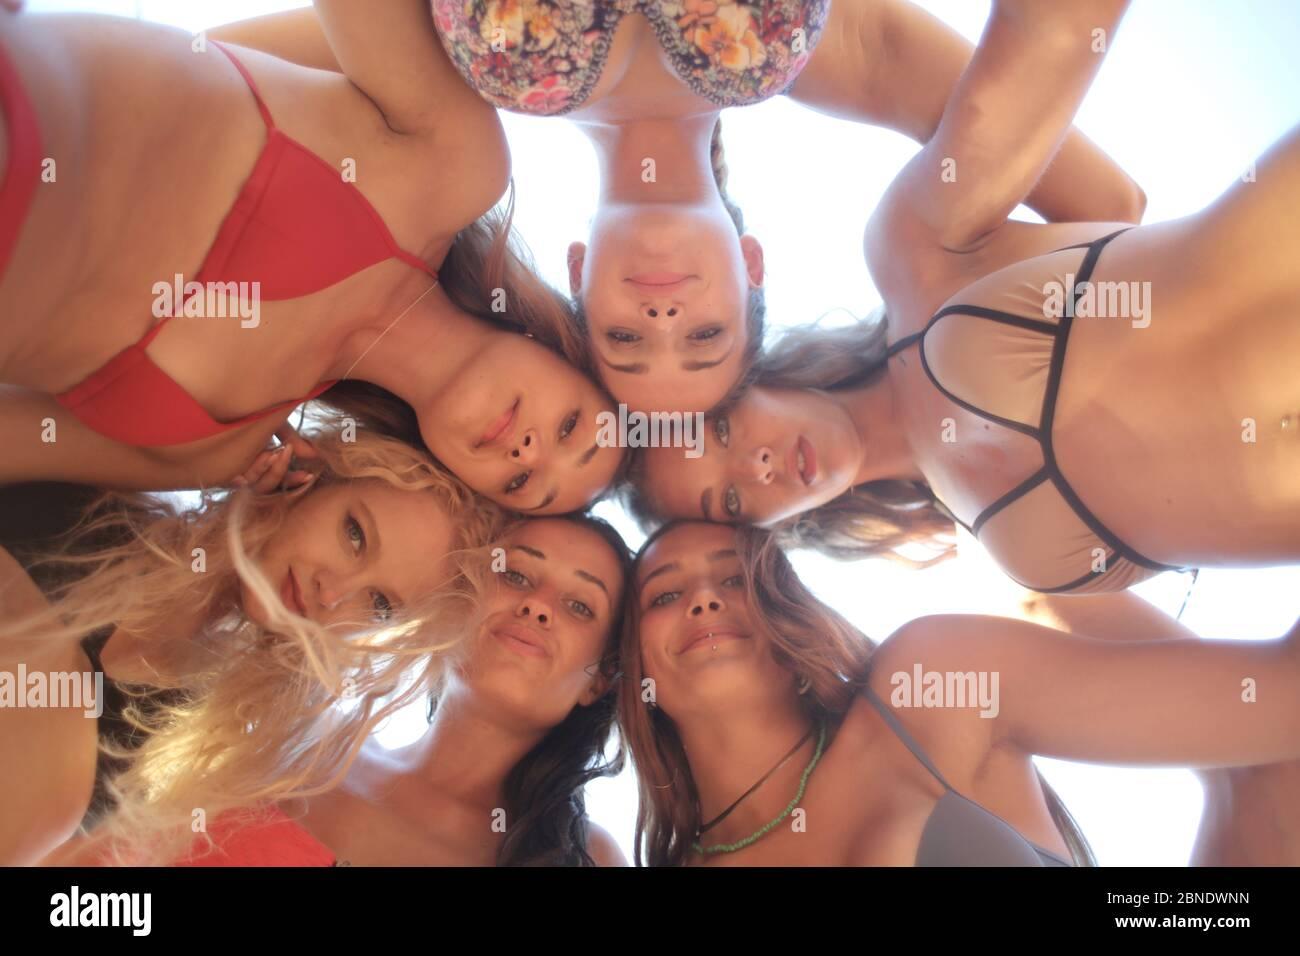 Pics bikini girls 50 Hottest